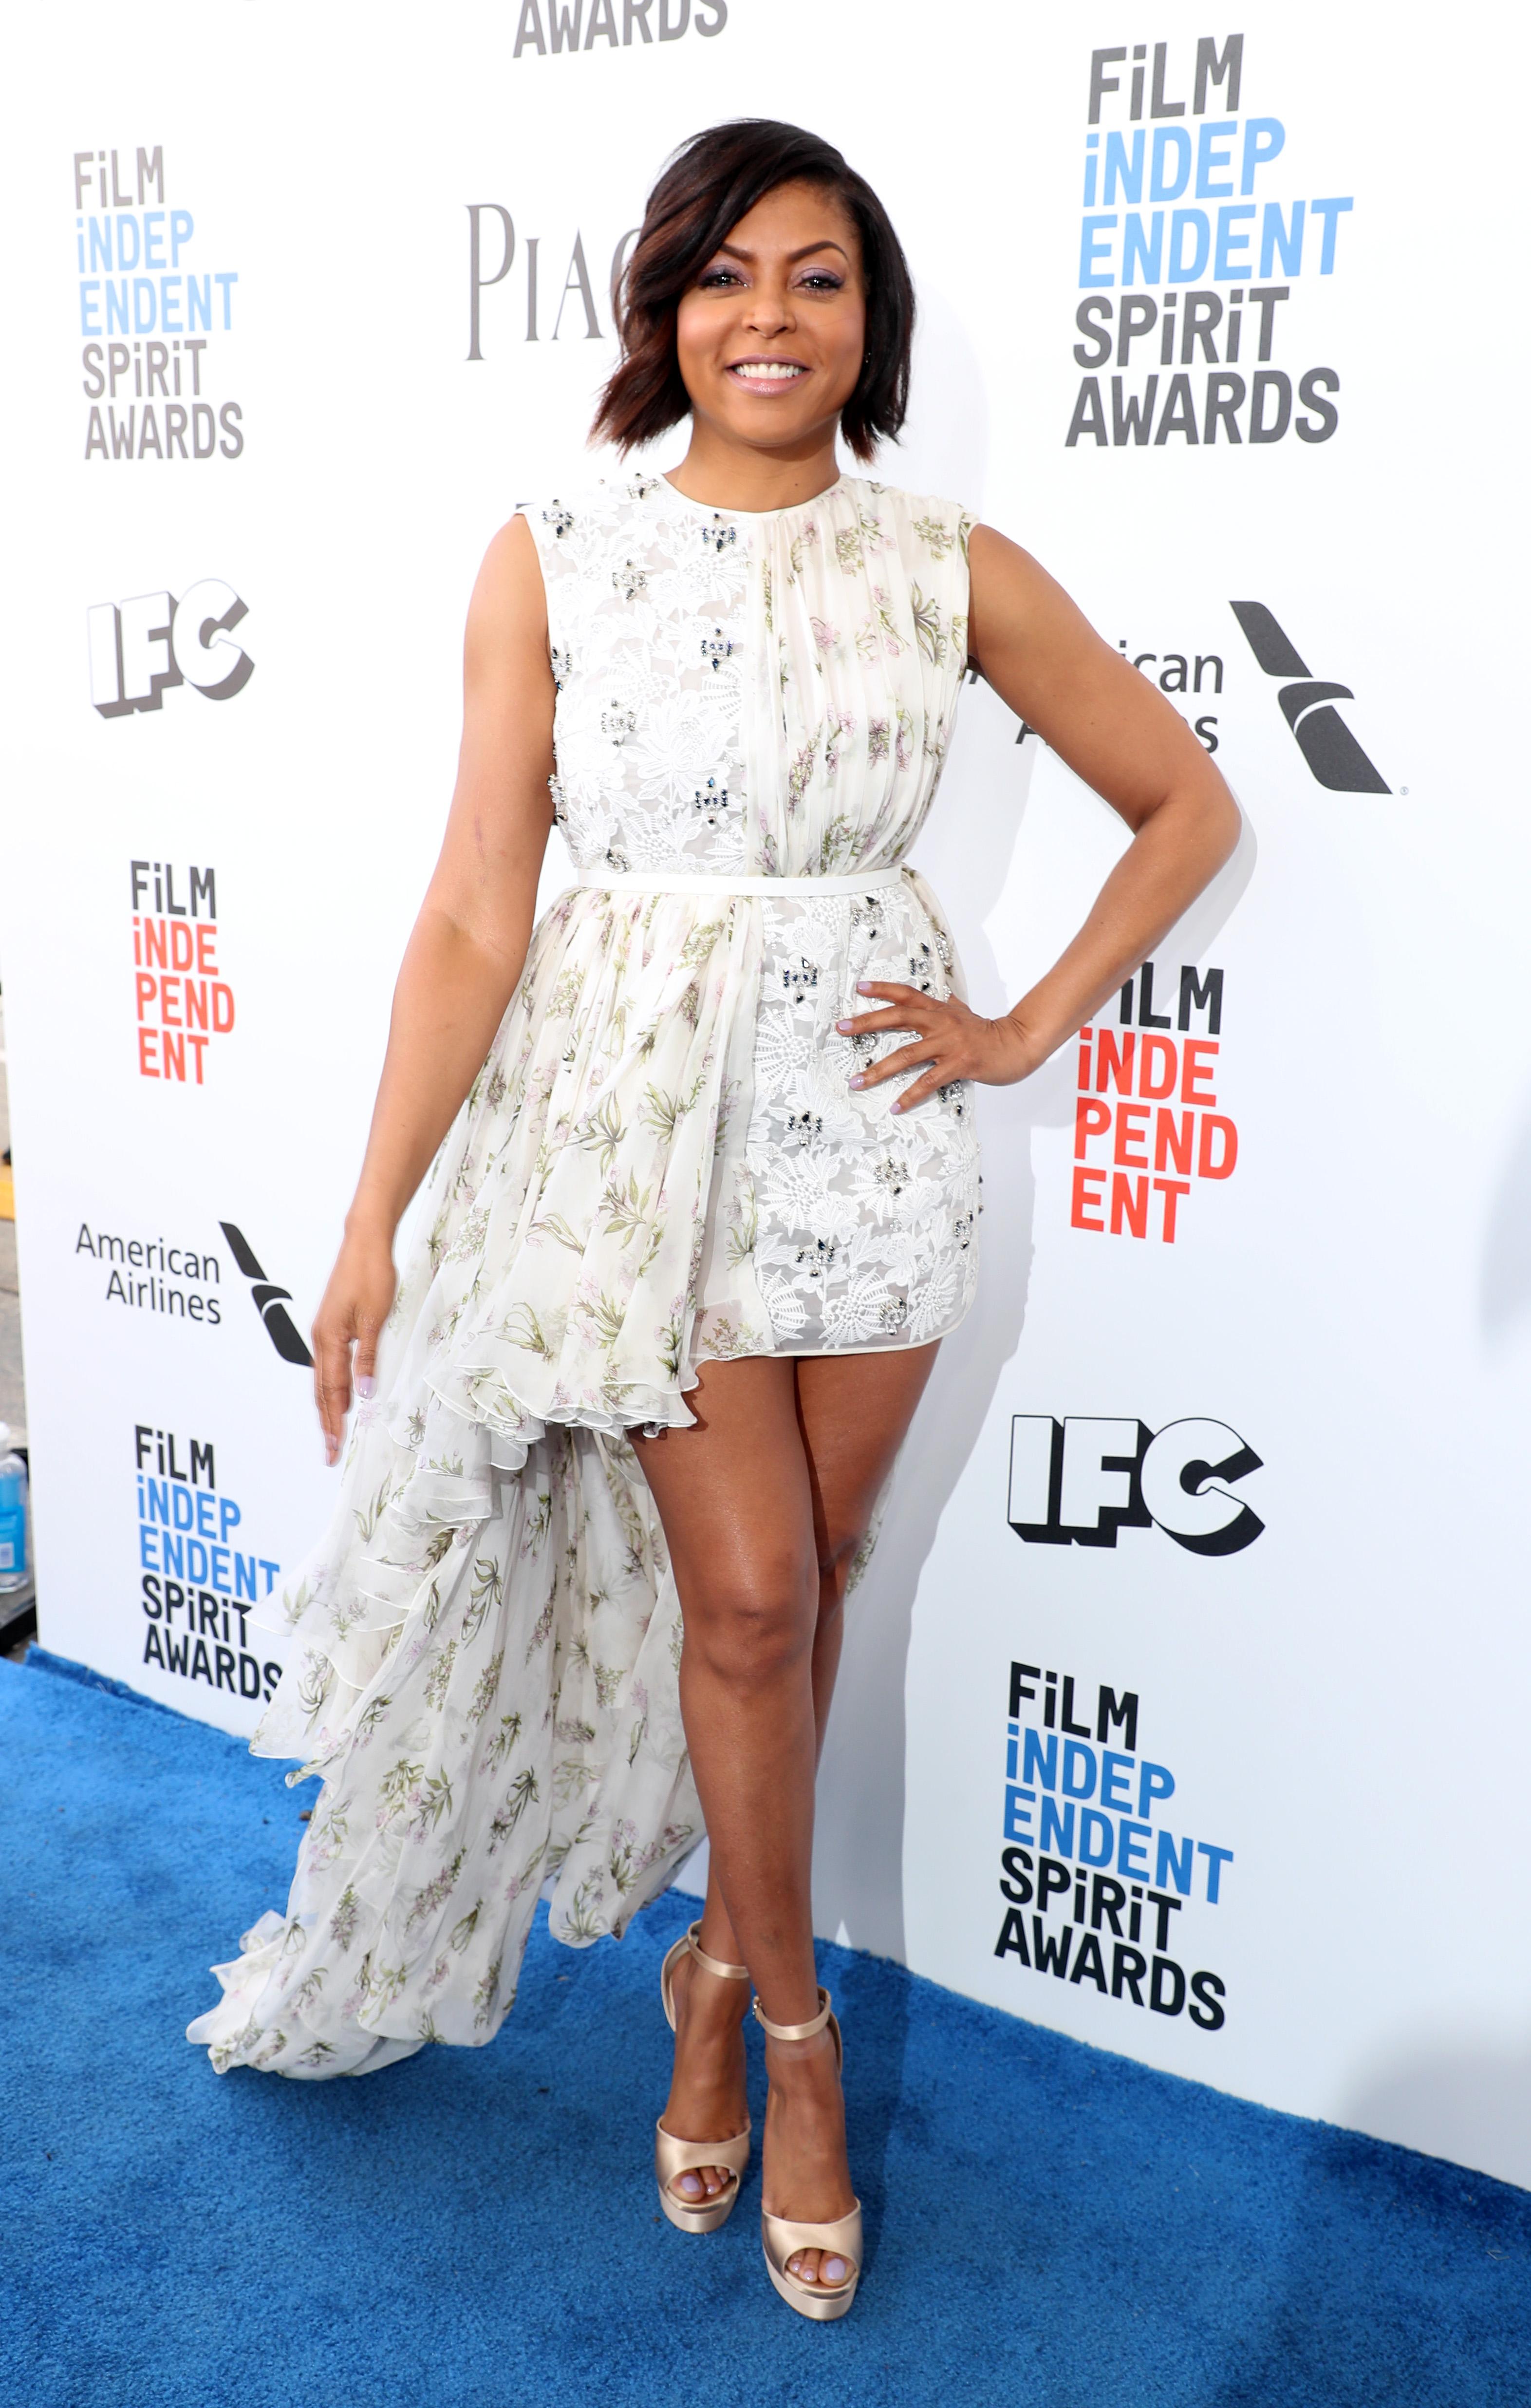 Taraji P. Henson in Giambattista Valli 32nd Film Independent Spirit Awards, Arrivals, Santa Monica, Los Angeles, USA - 25 Feb 2017